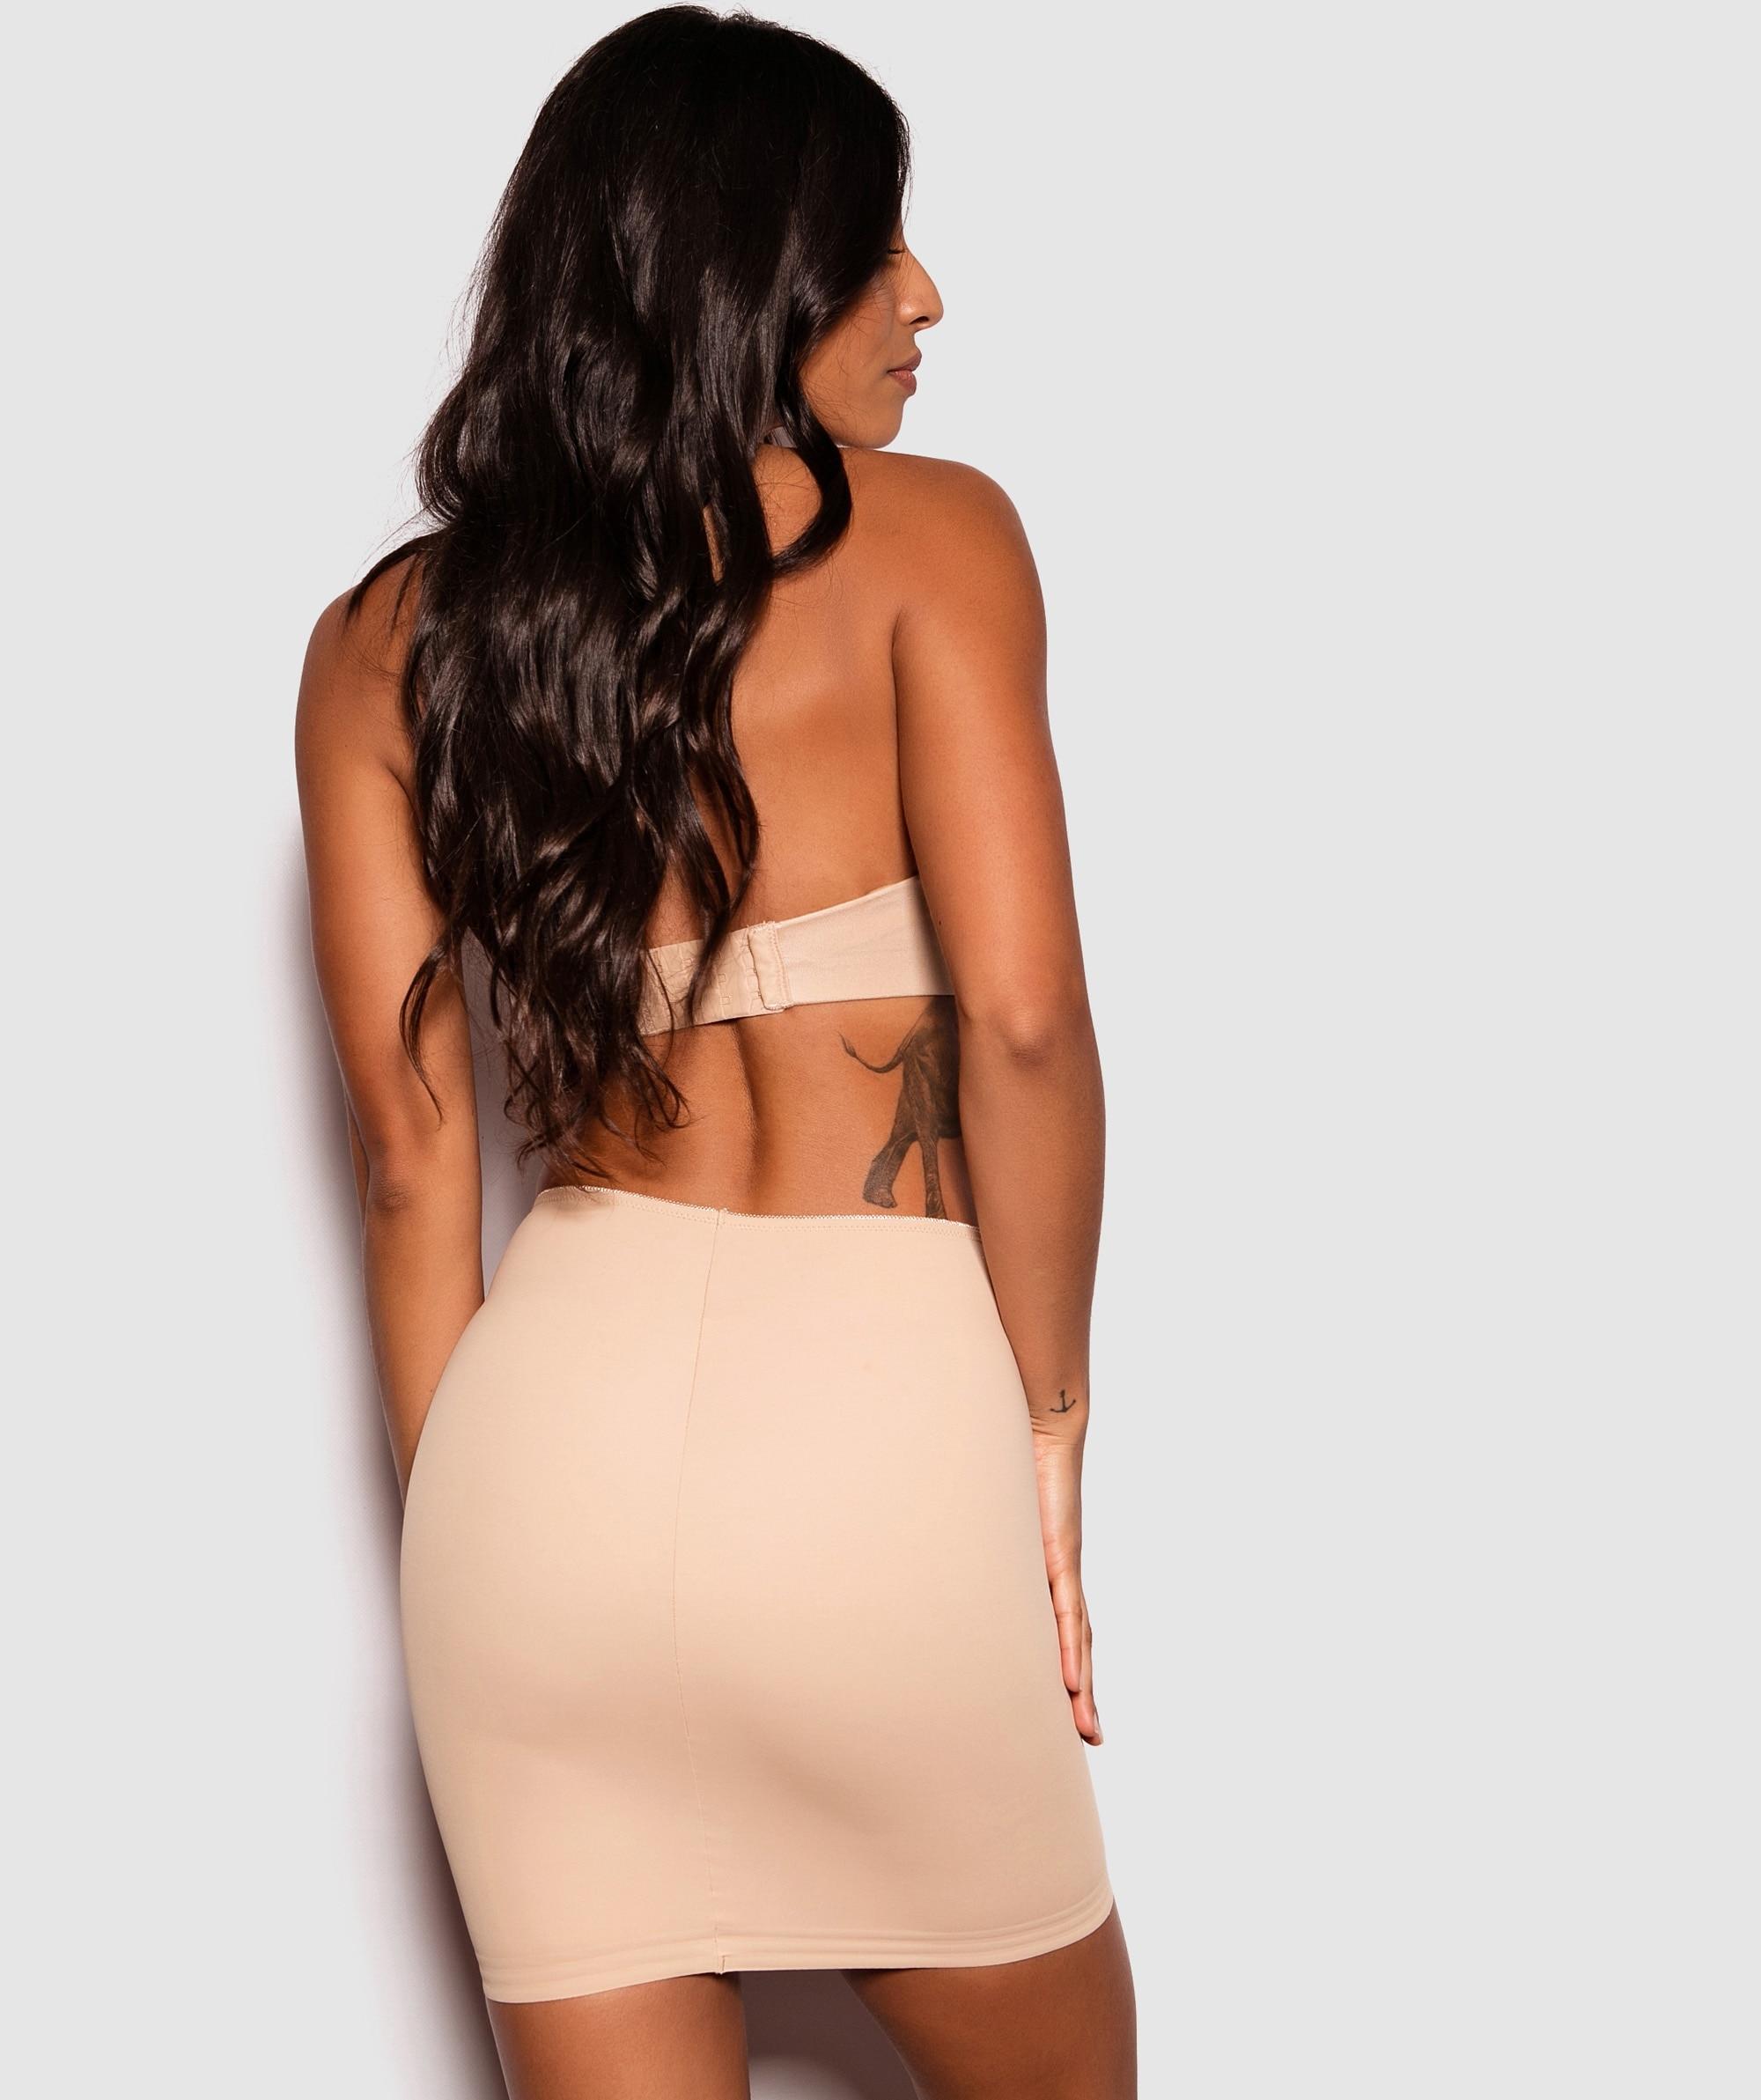 Microfibre Skirt - Nude